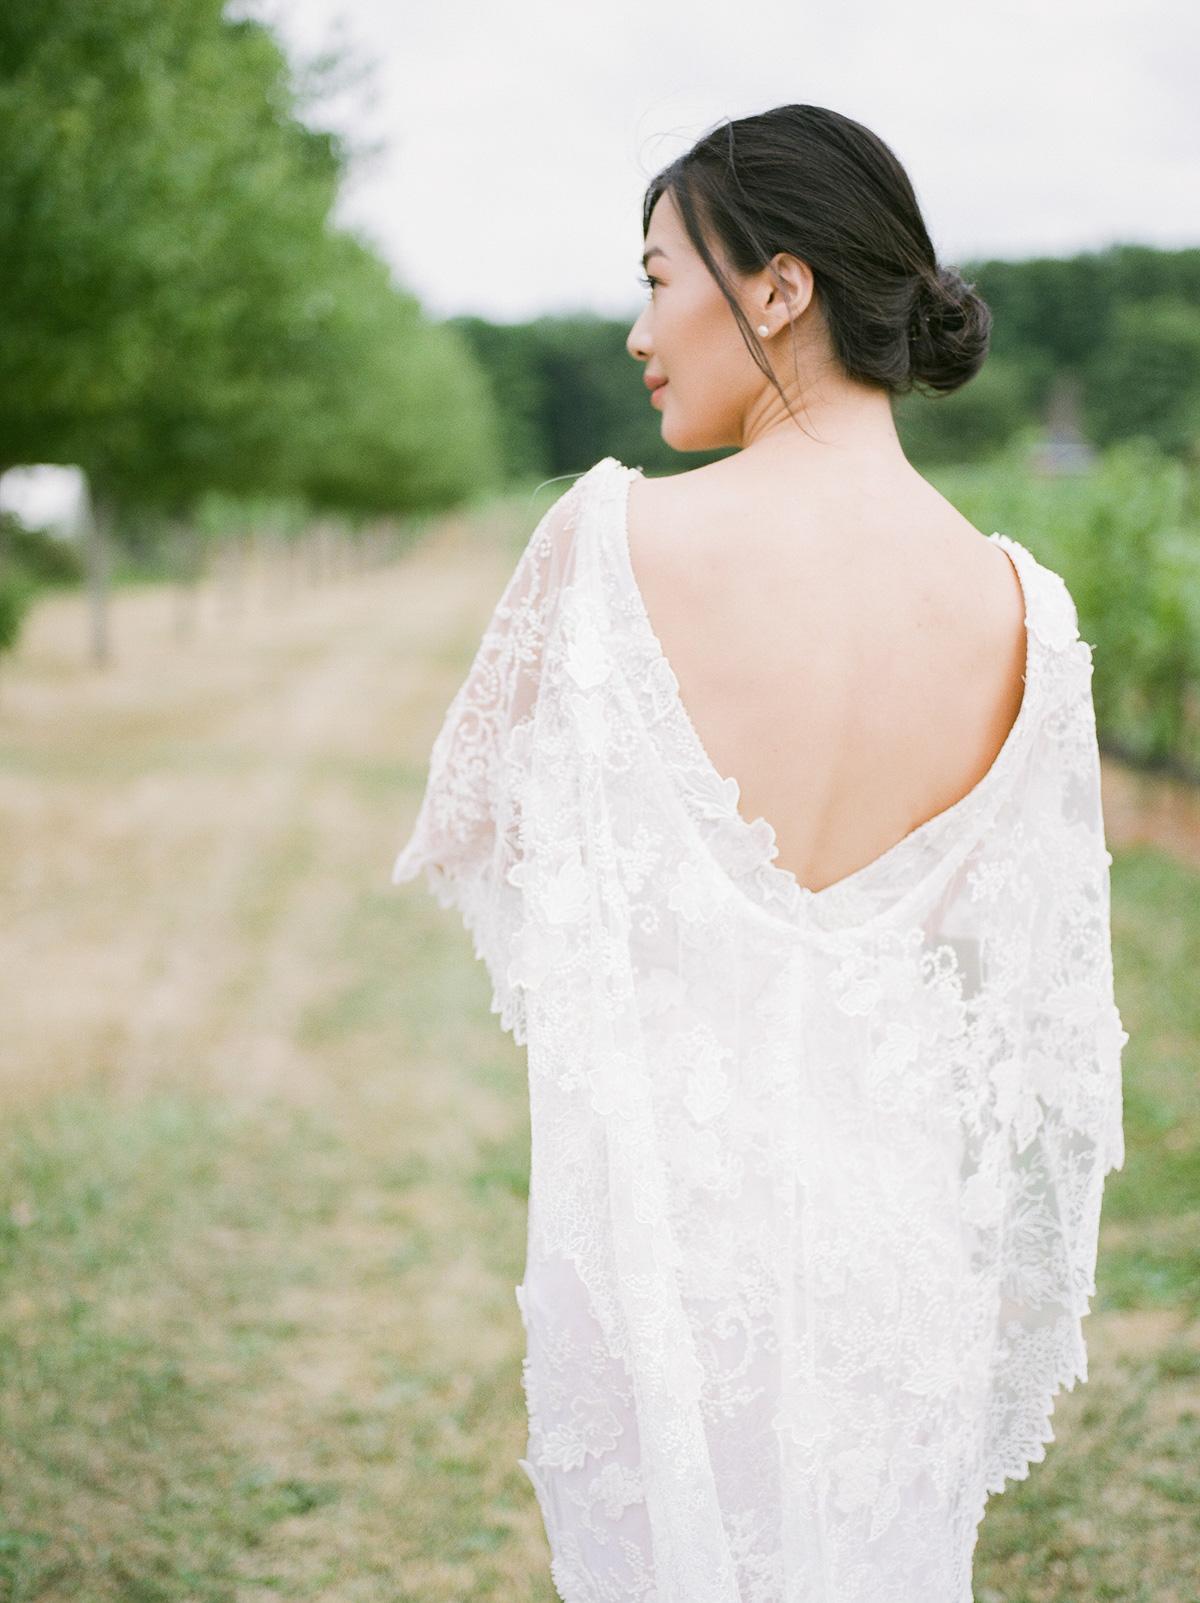 jennifer-xu-photography-vineyard-bride-swish-list-rosewod-eatstes-winery-beamsville-wedding-editorial-13.jpg